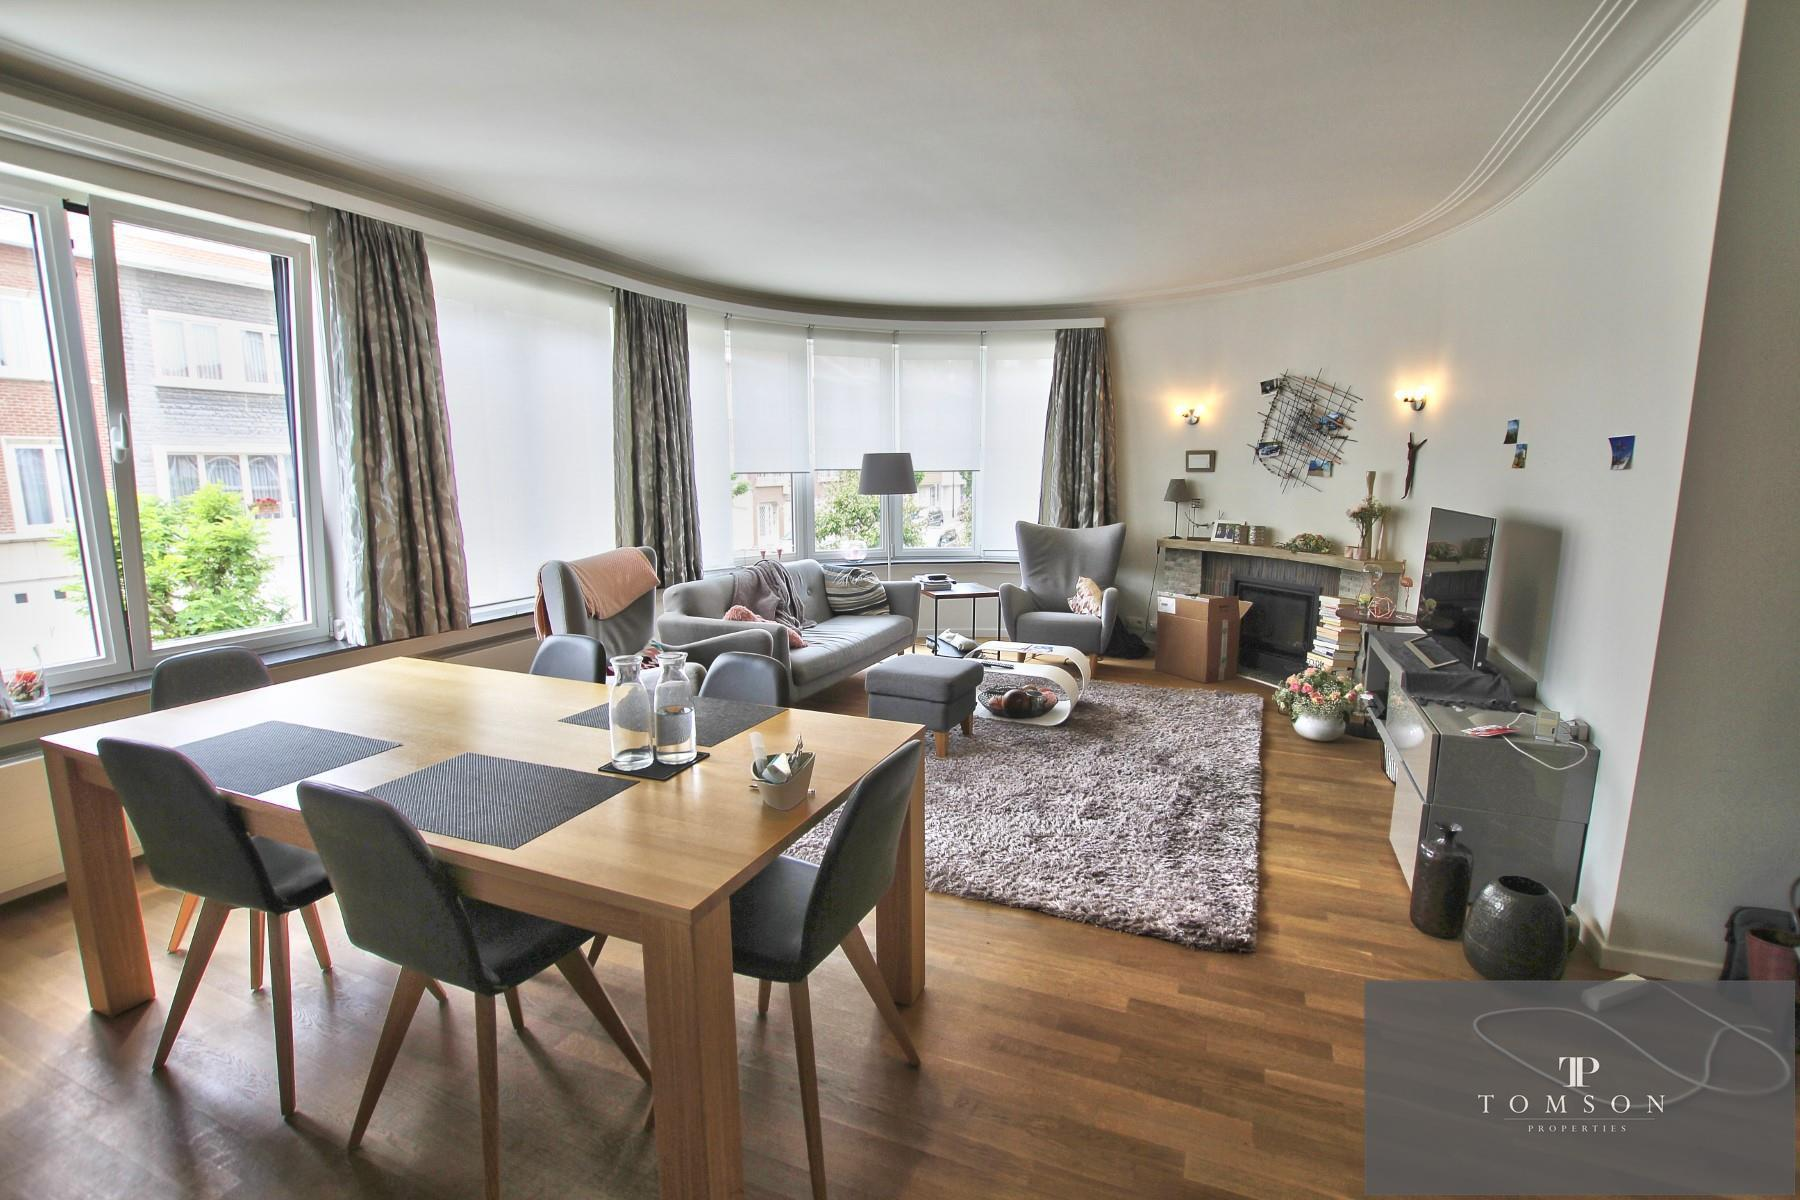 Appartement exceptionnel - Woluwe-Saint-Pierre - #4349832-0